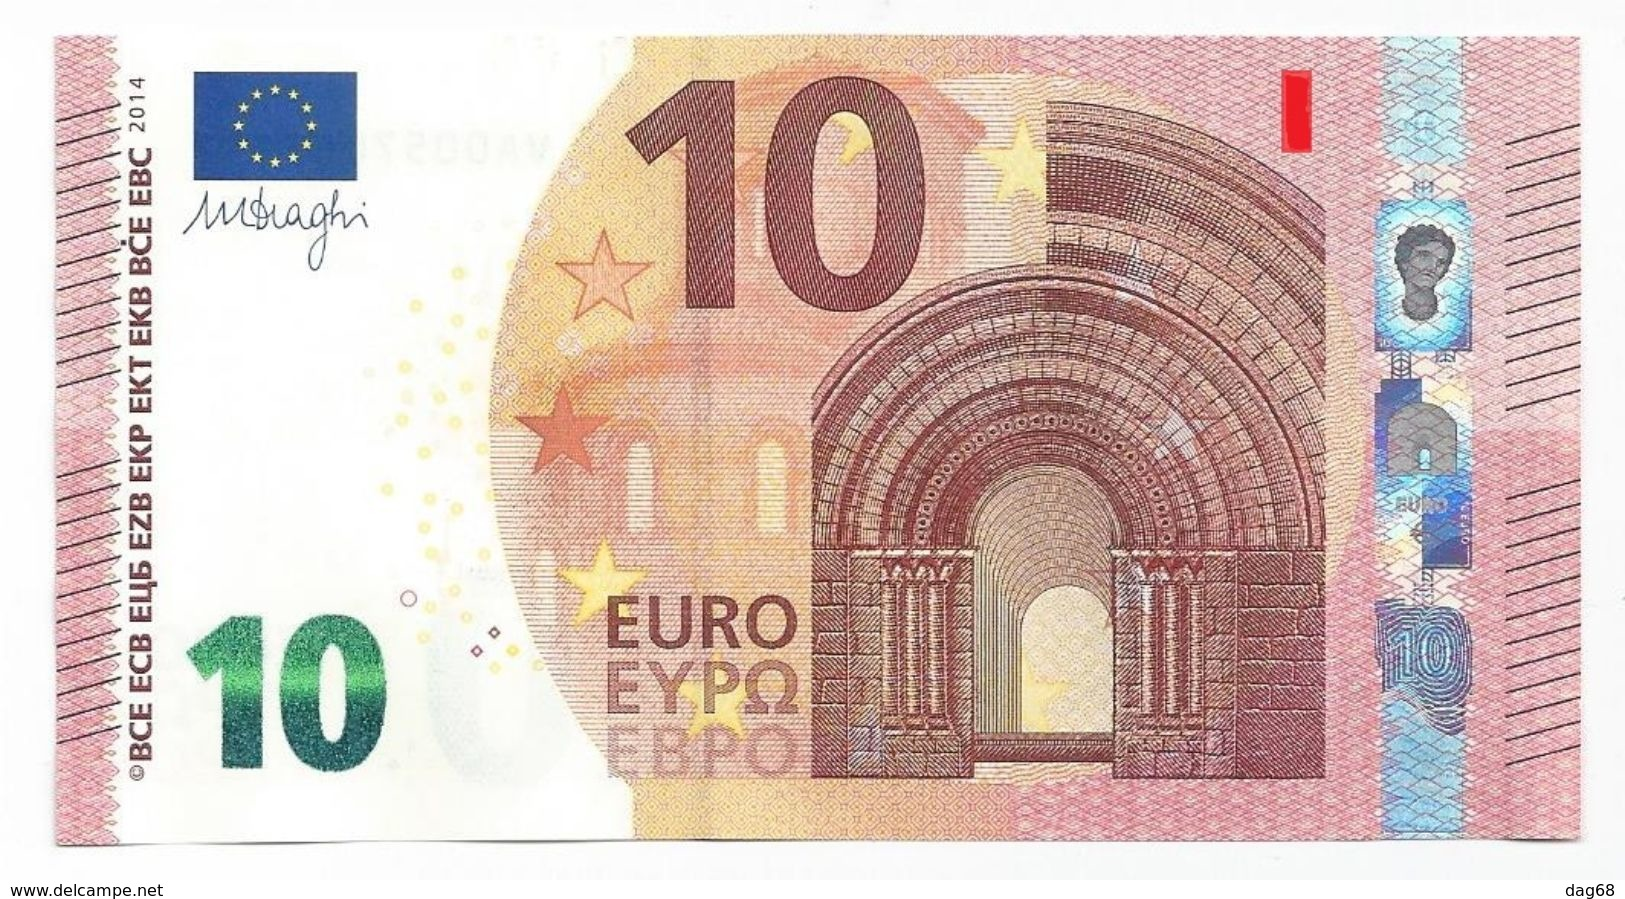 EURO FRANCE 10 U003 I6 UF*07 UNC DRAGHI - EURO